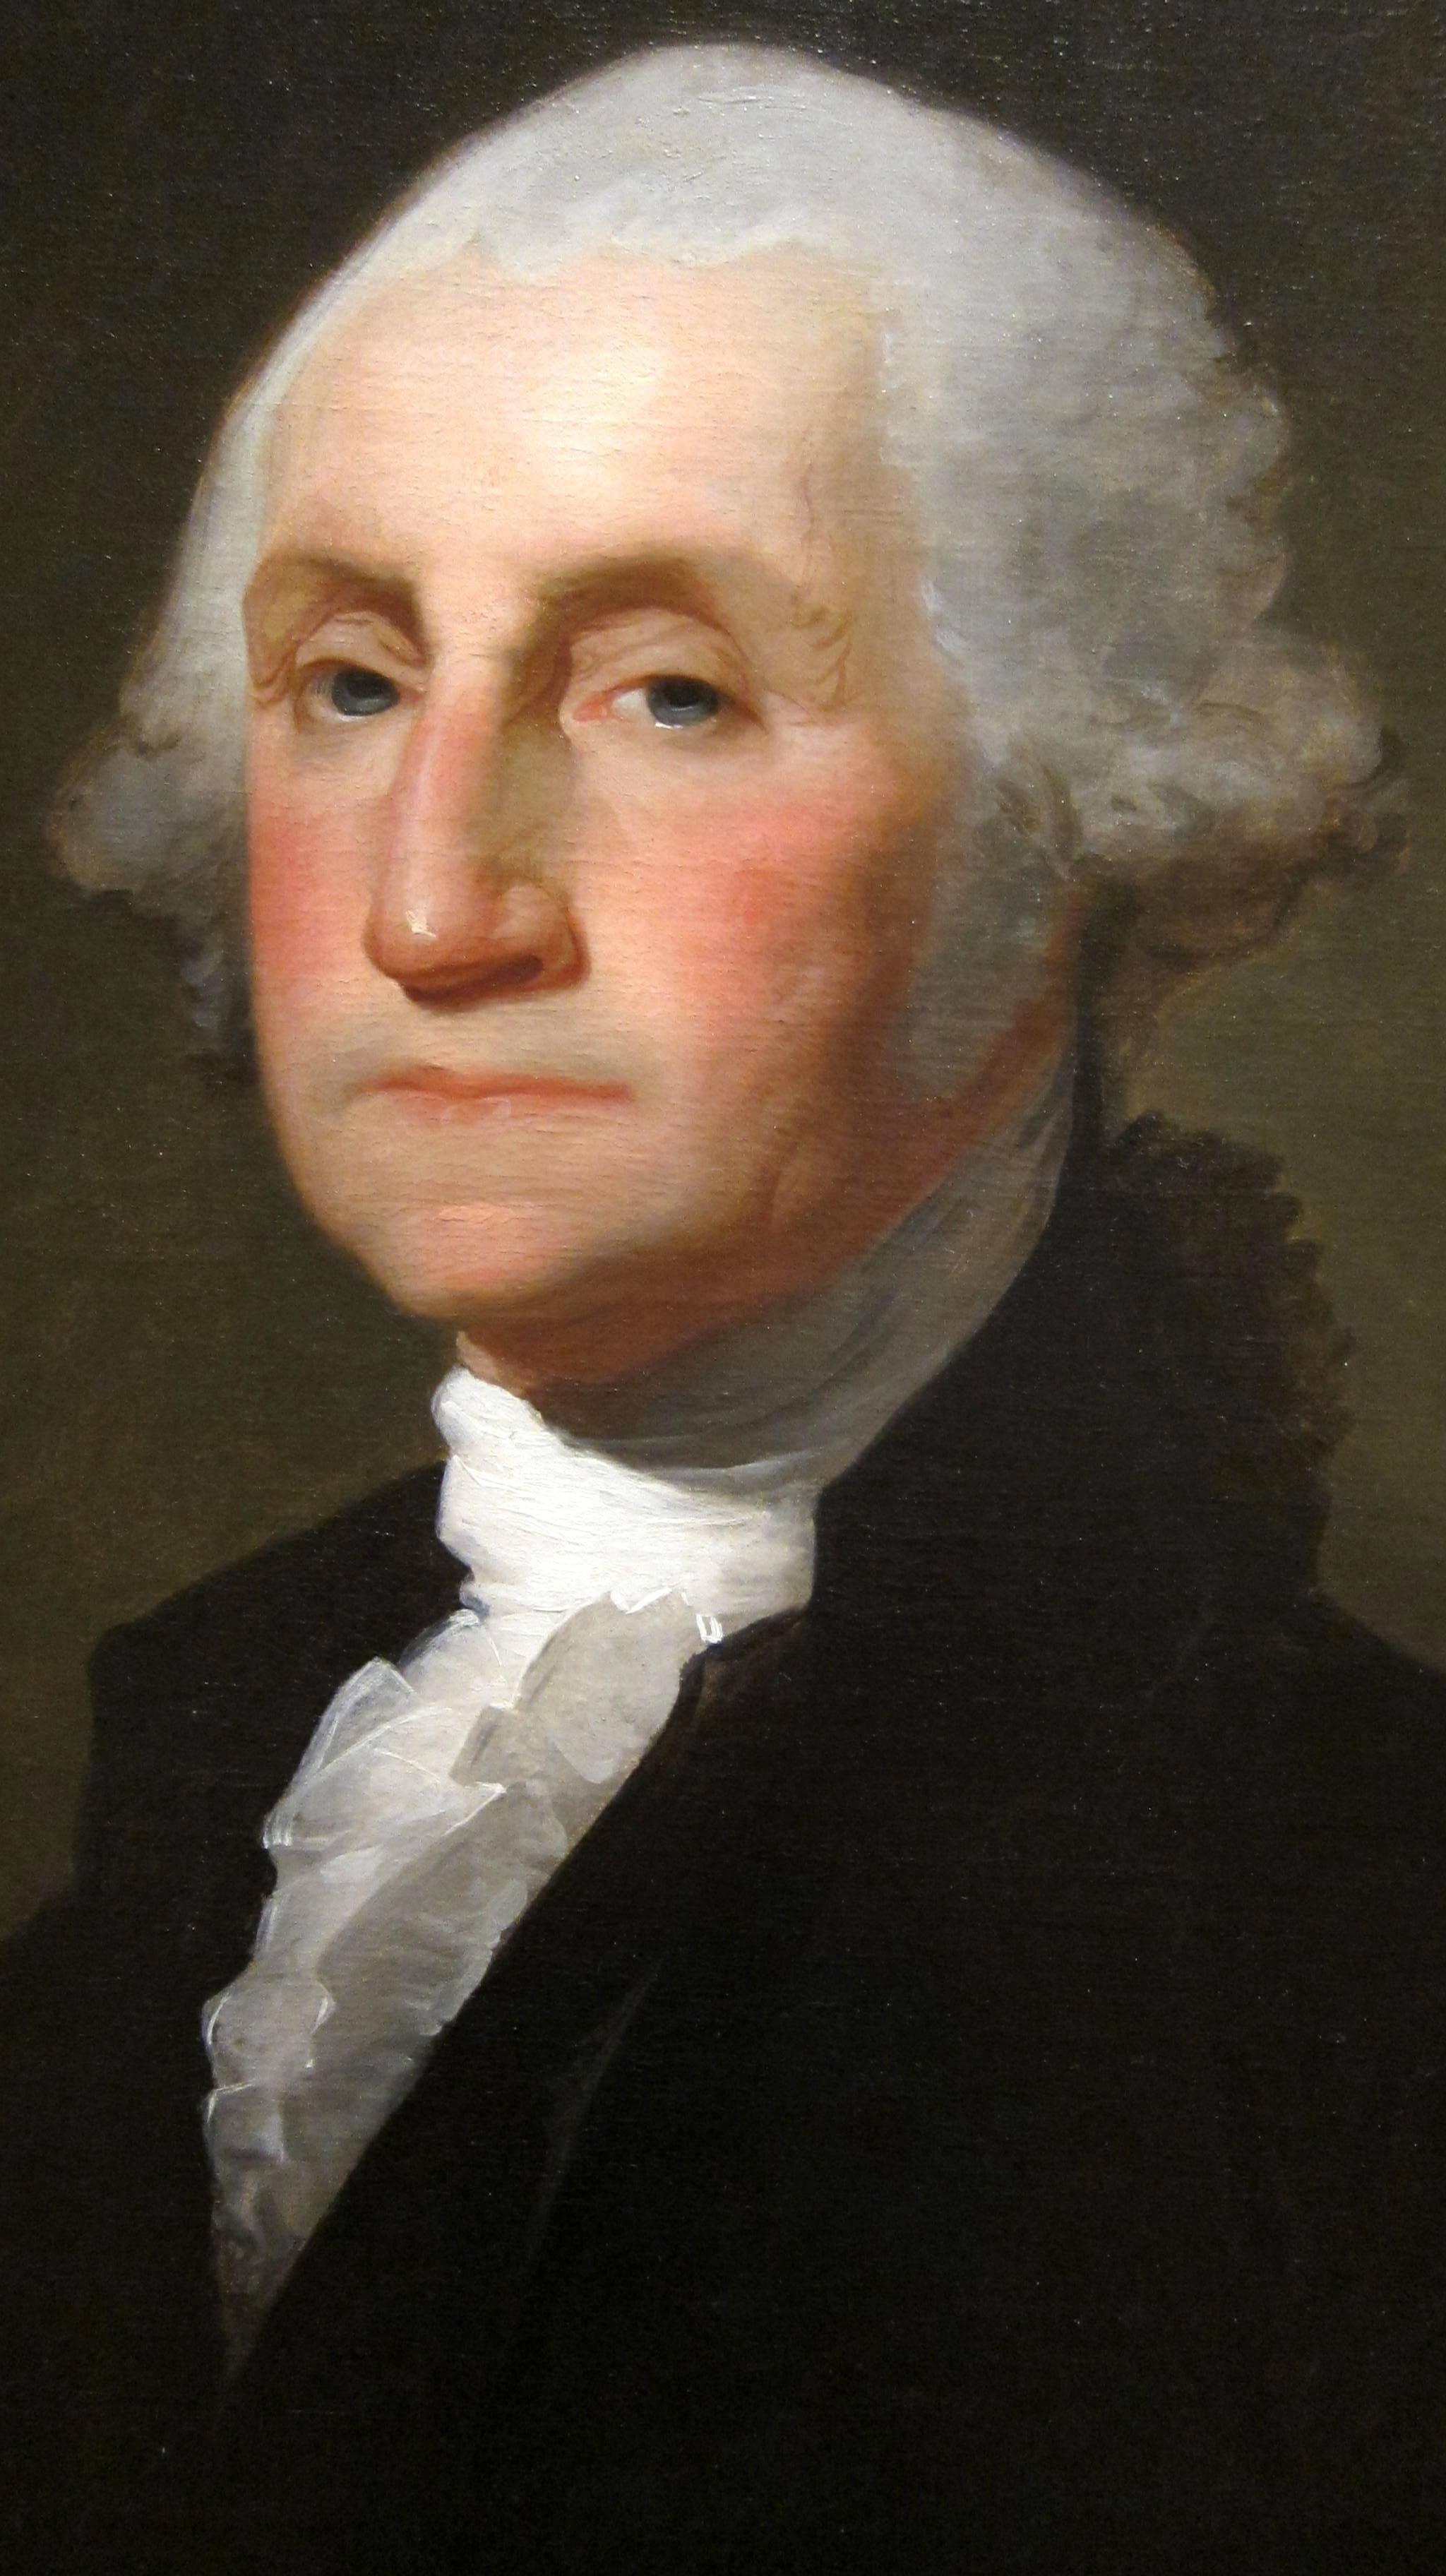 George-Washington-facts